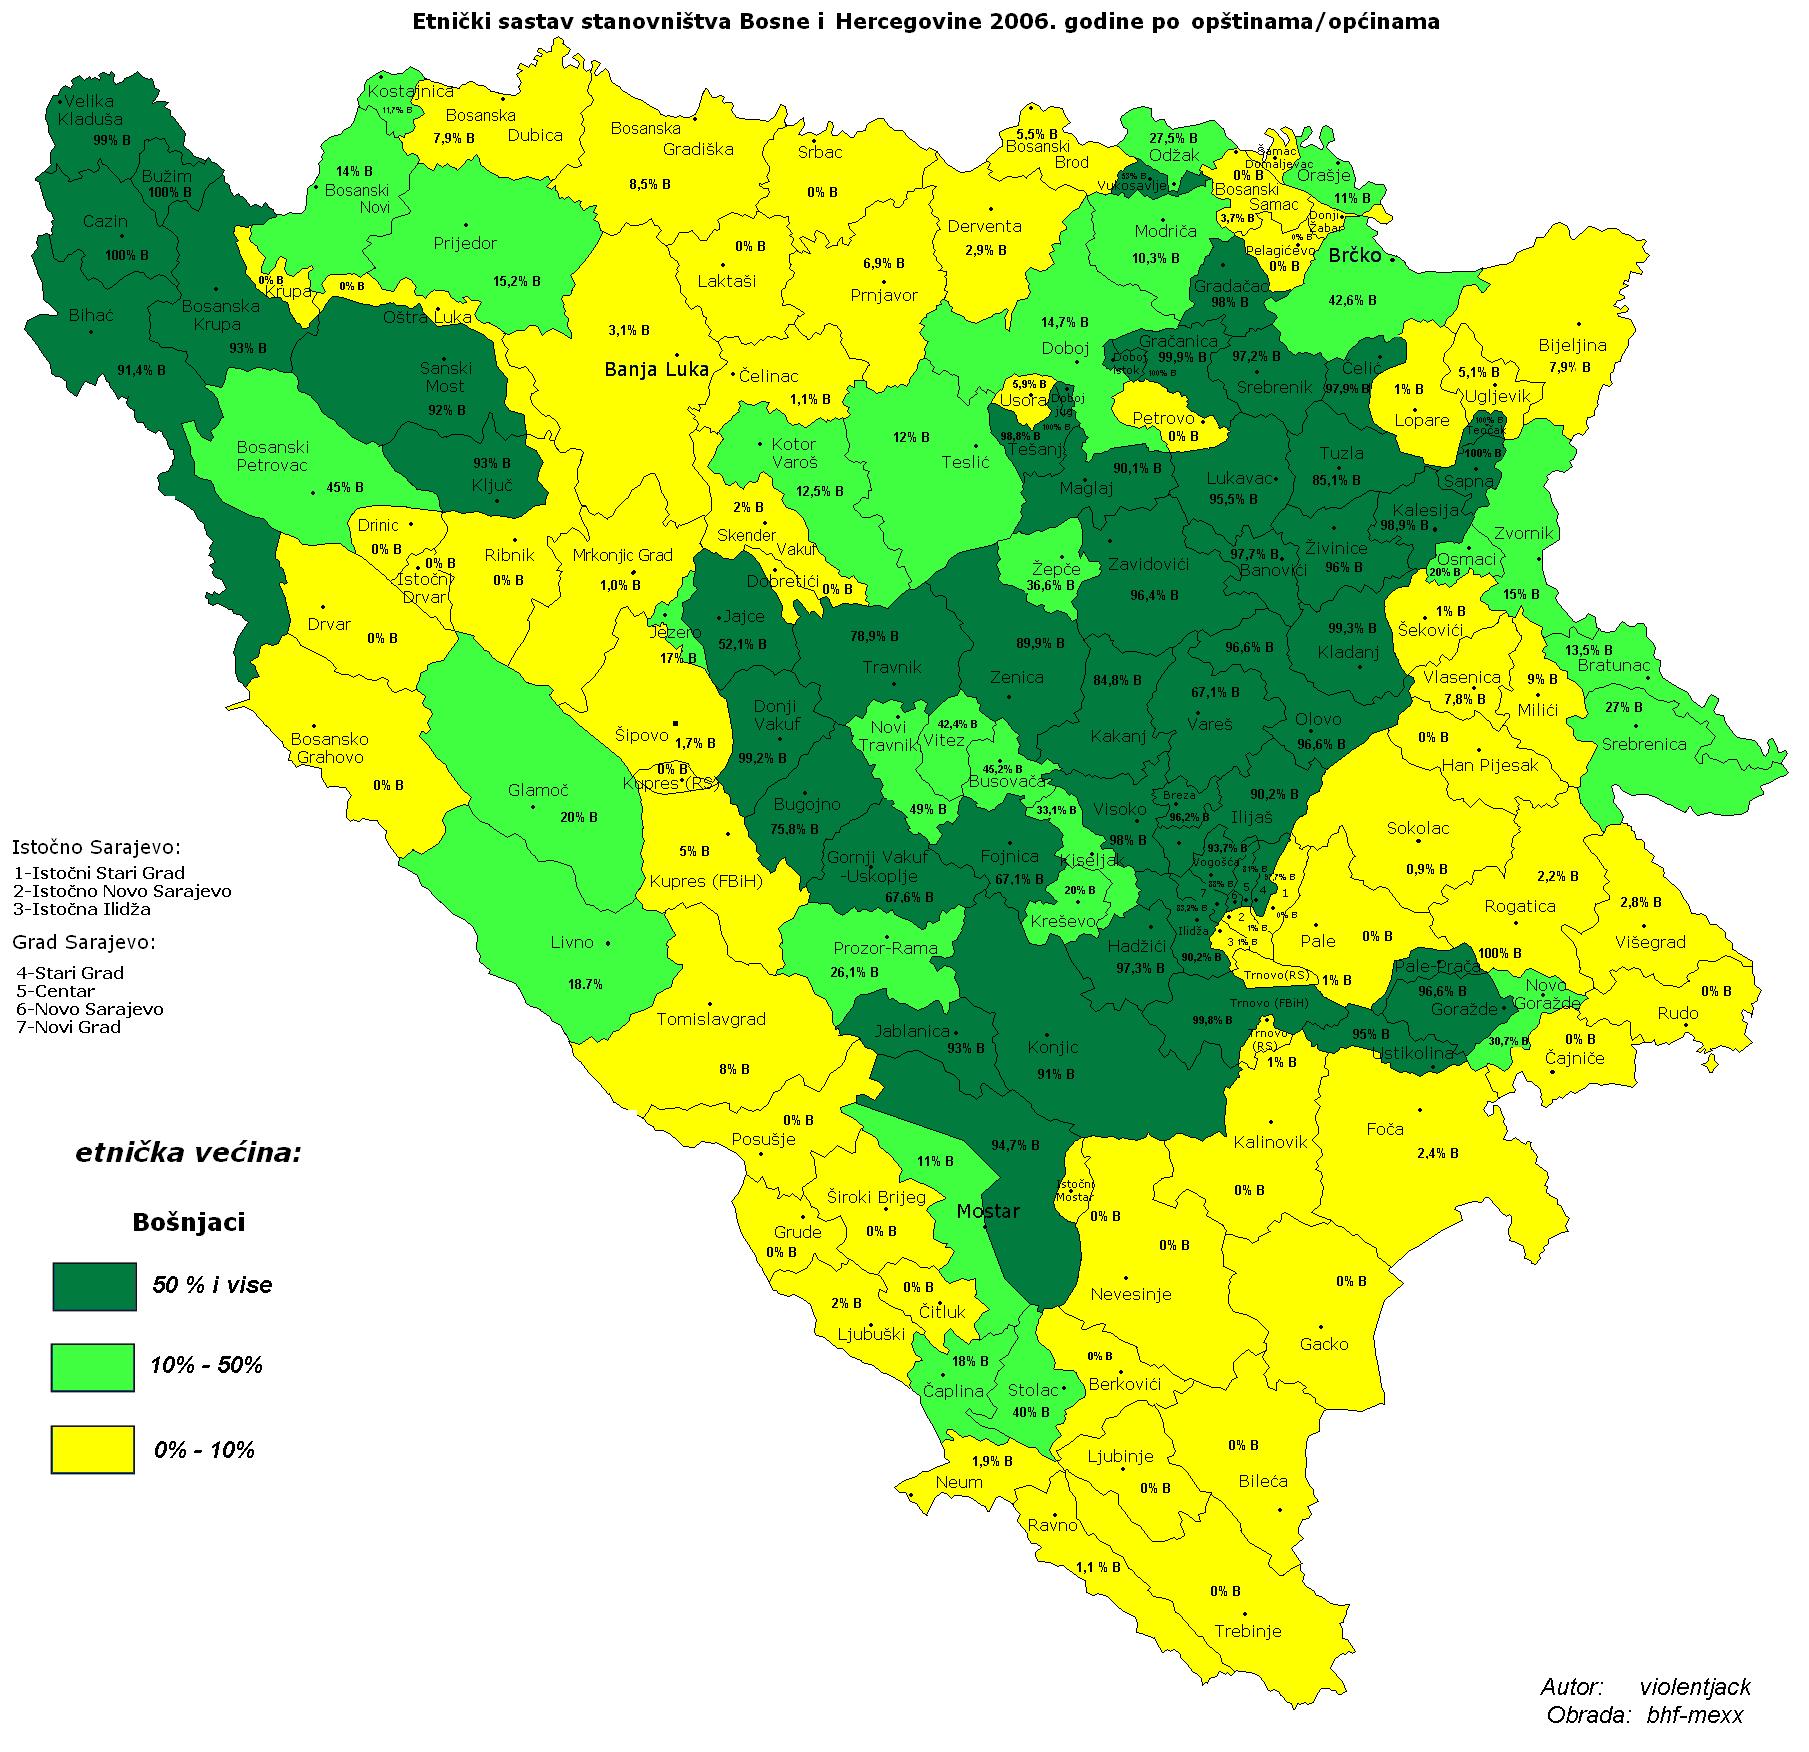 karta bih File:Demografska Karta BIH Bosnjaci.png   Wikipedia karta bih